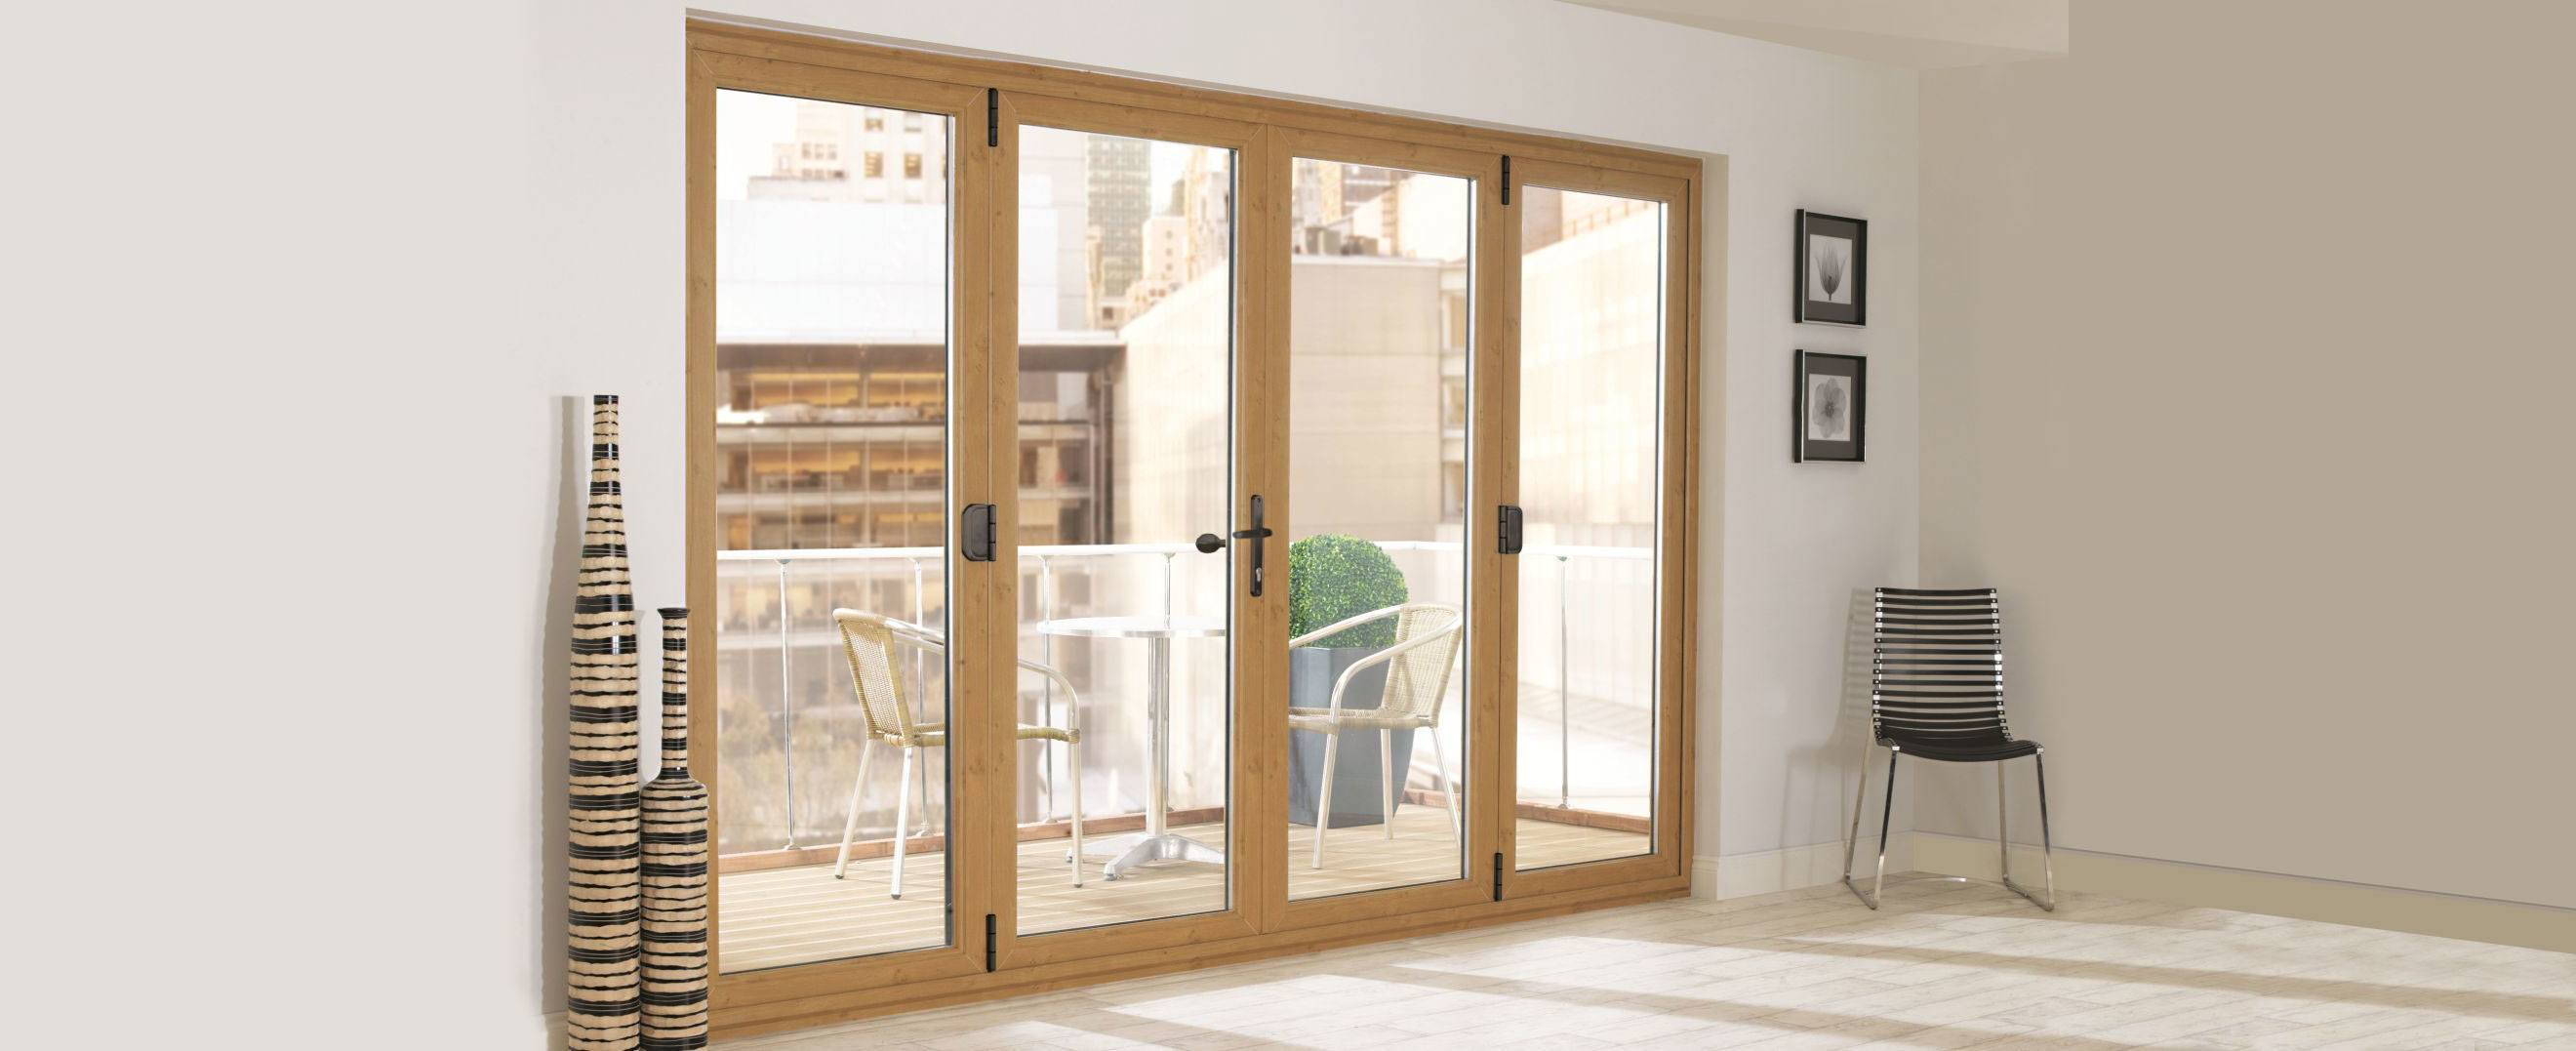 A Glass Glazing Shropshire Ltd